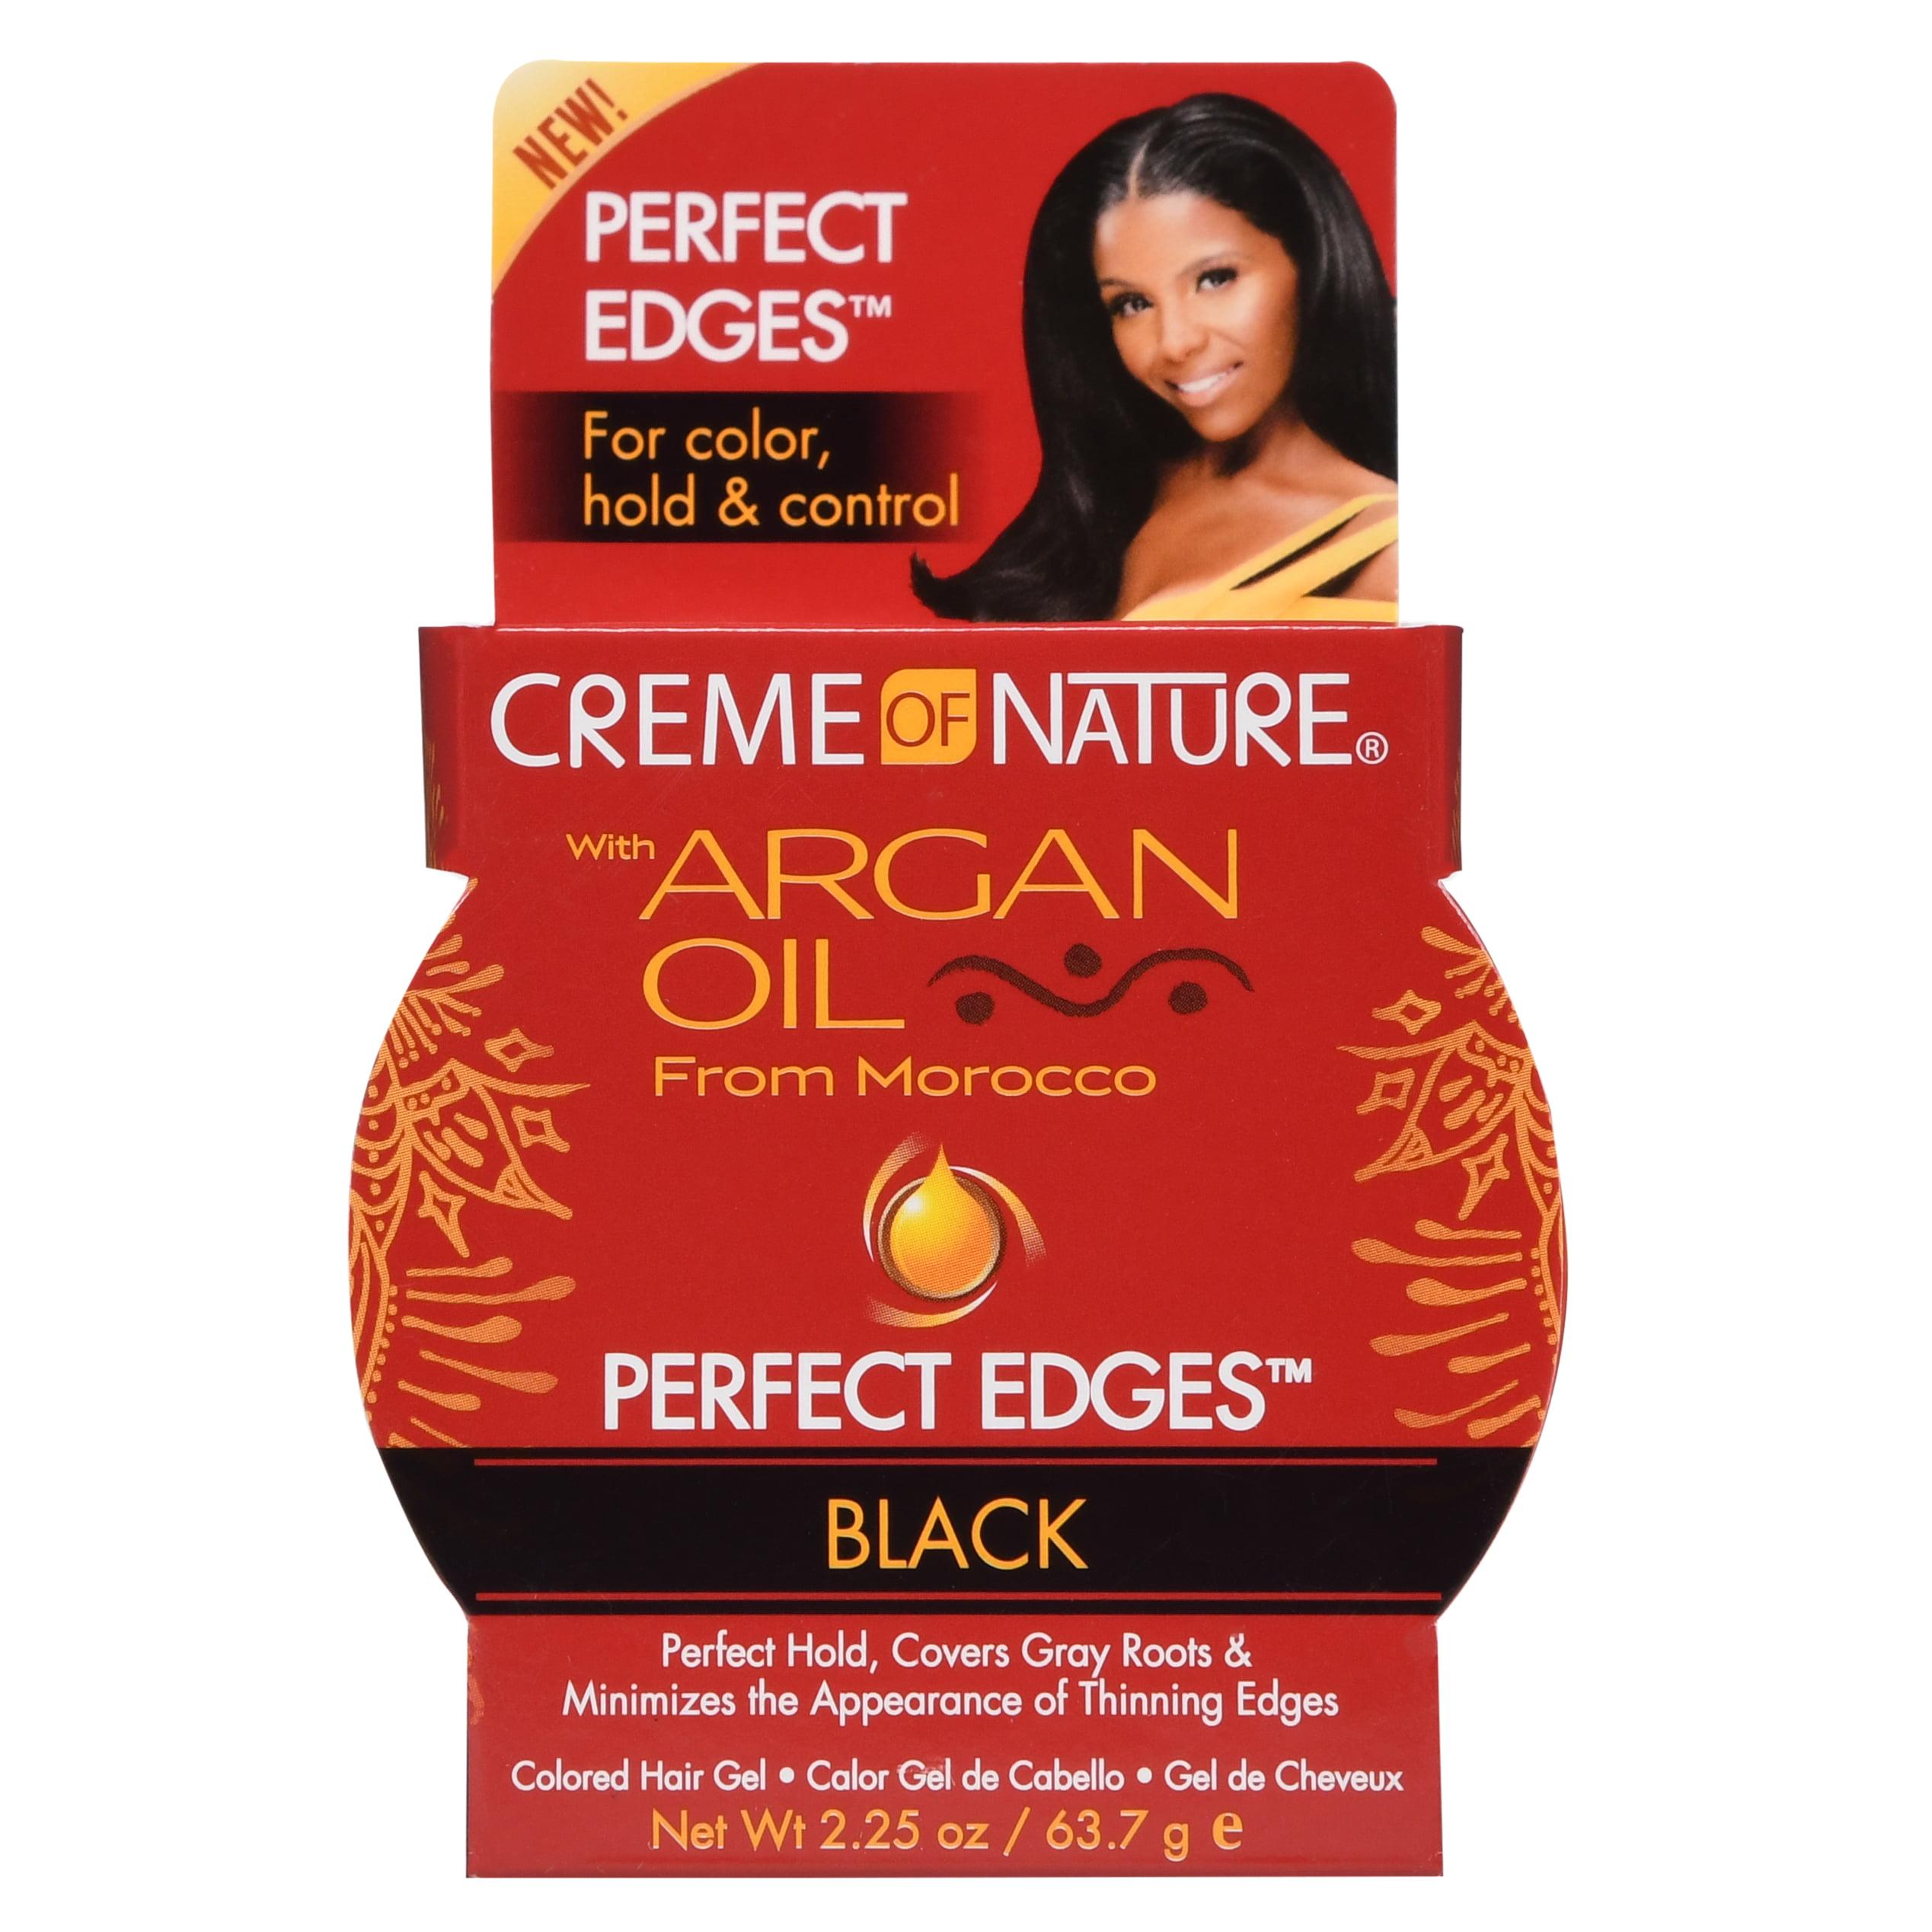 Creme of Nature Perfect Edges, Black 2.25 oz